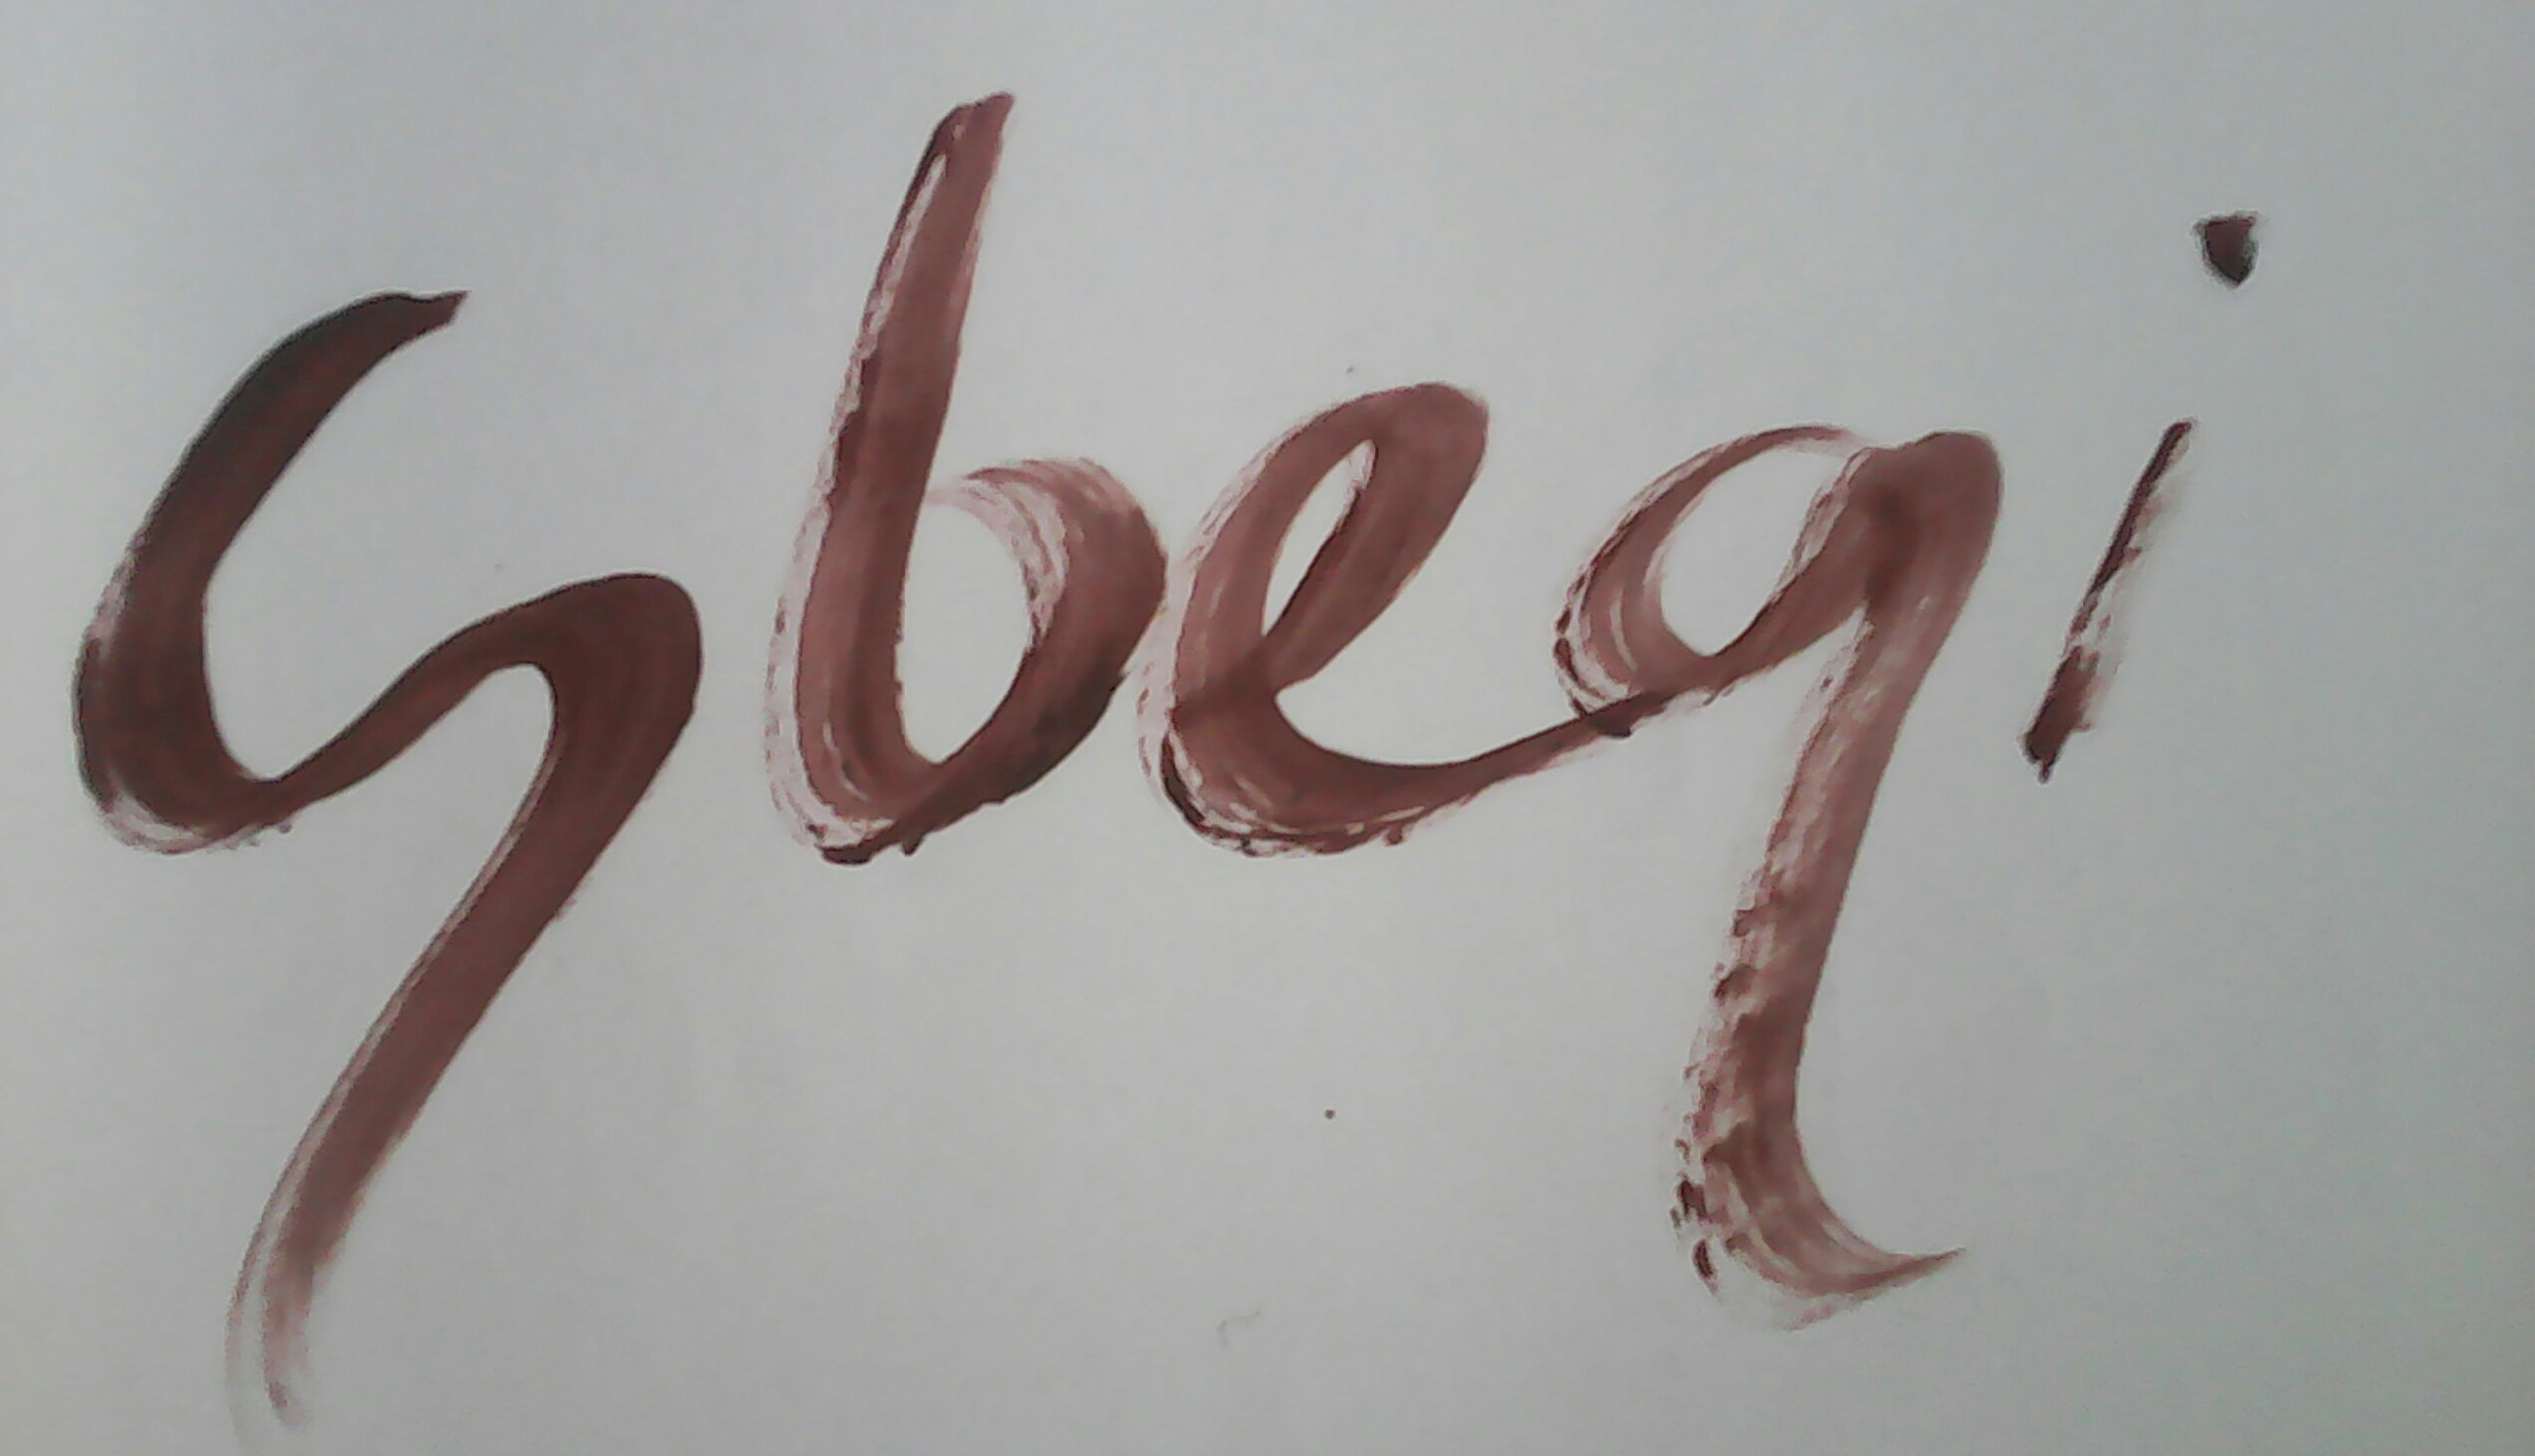 Olugbenga Akande's Signature